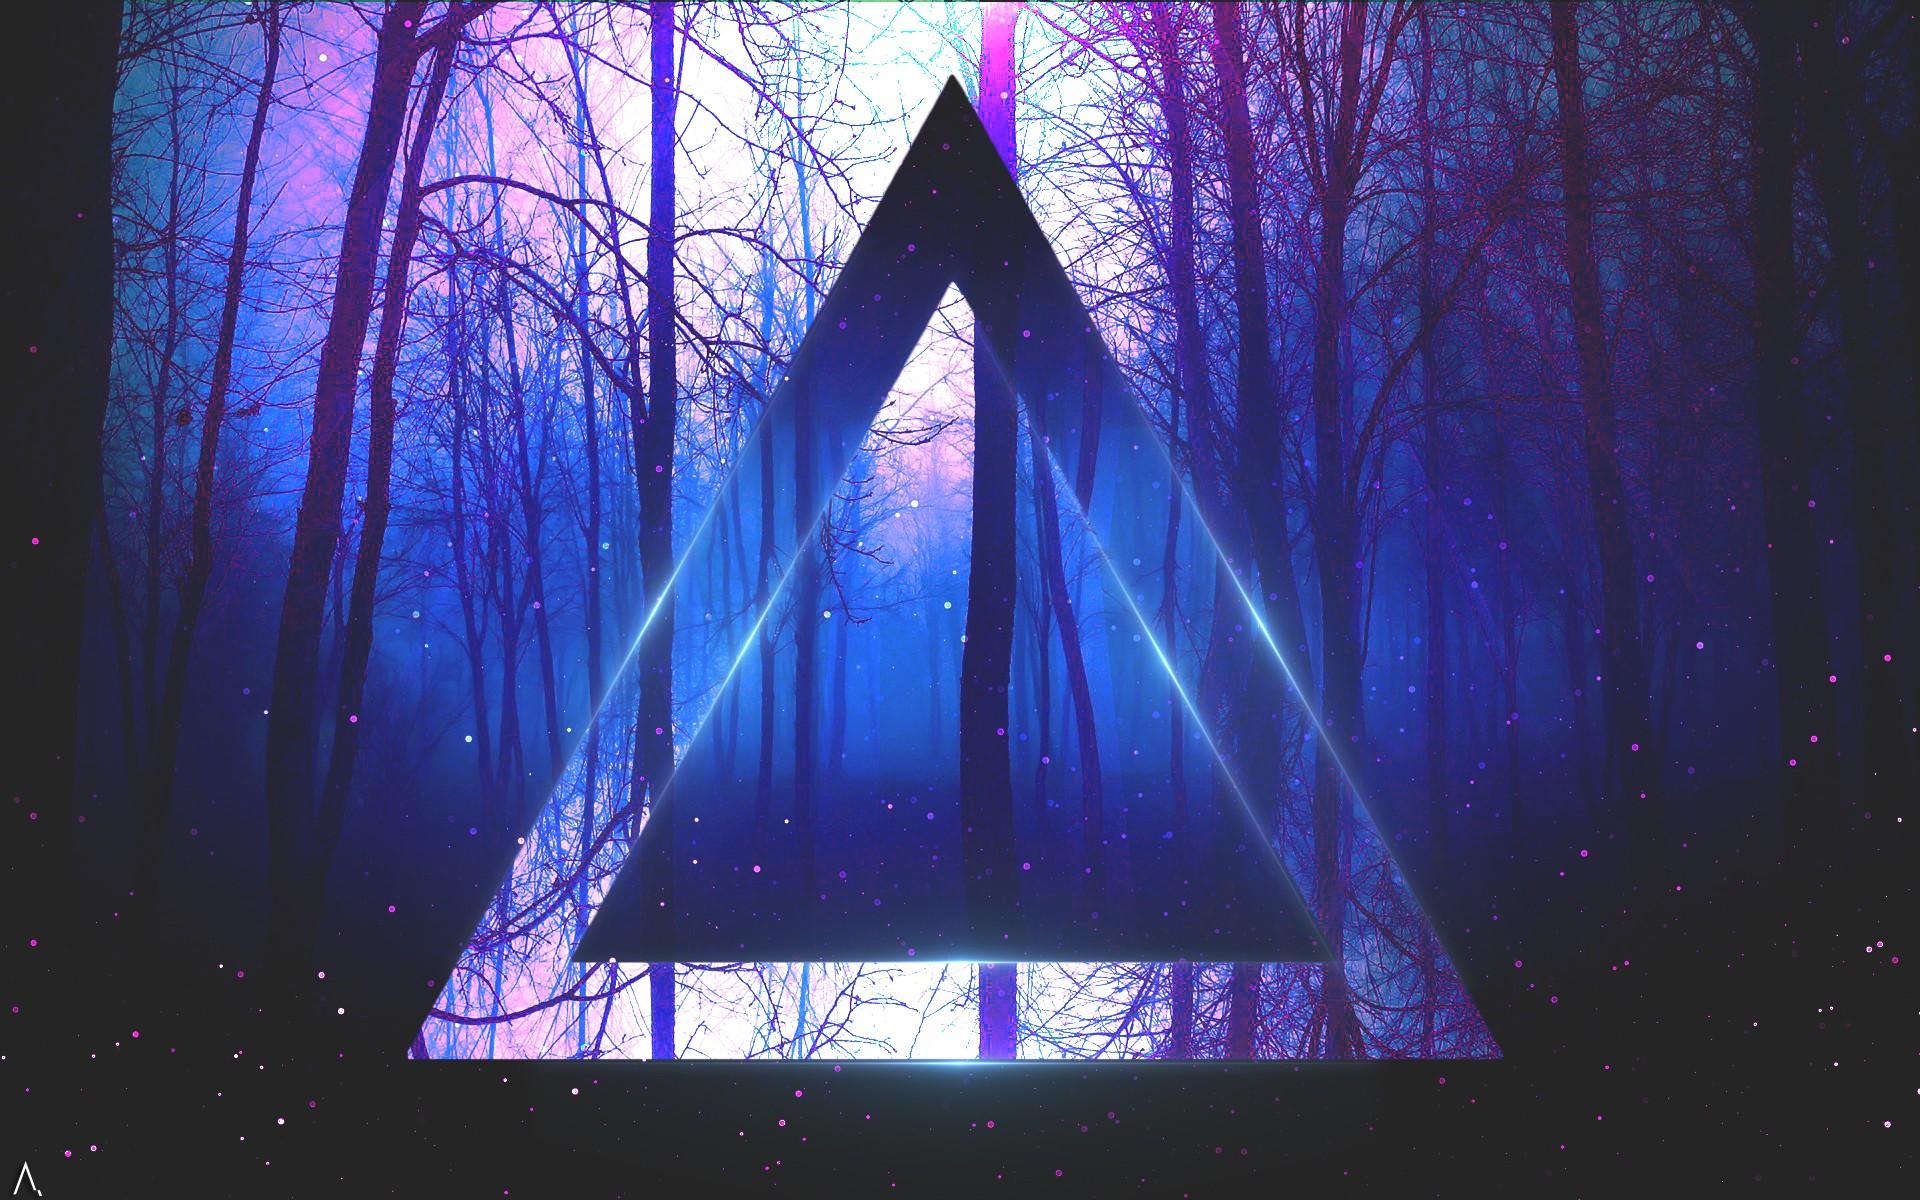 Sunlight Trees Digital Art Night Abstract Reflection Artwork Blue Triangle Atmosphere Light Star Darkness Screenshot Computer